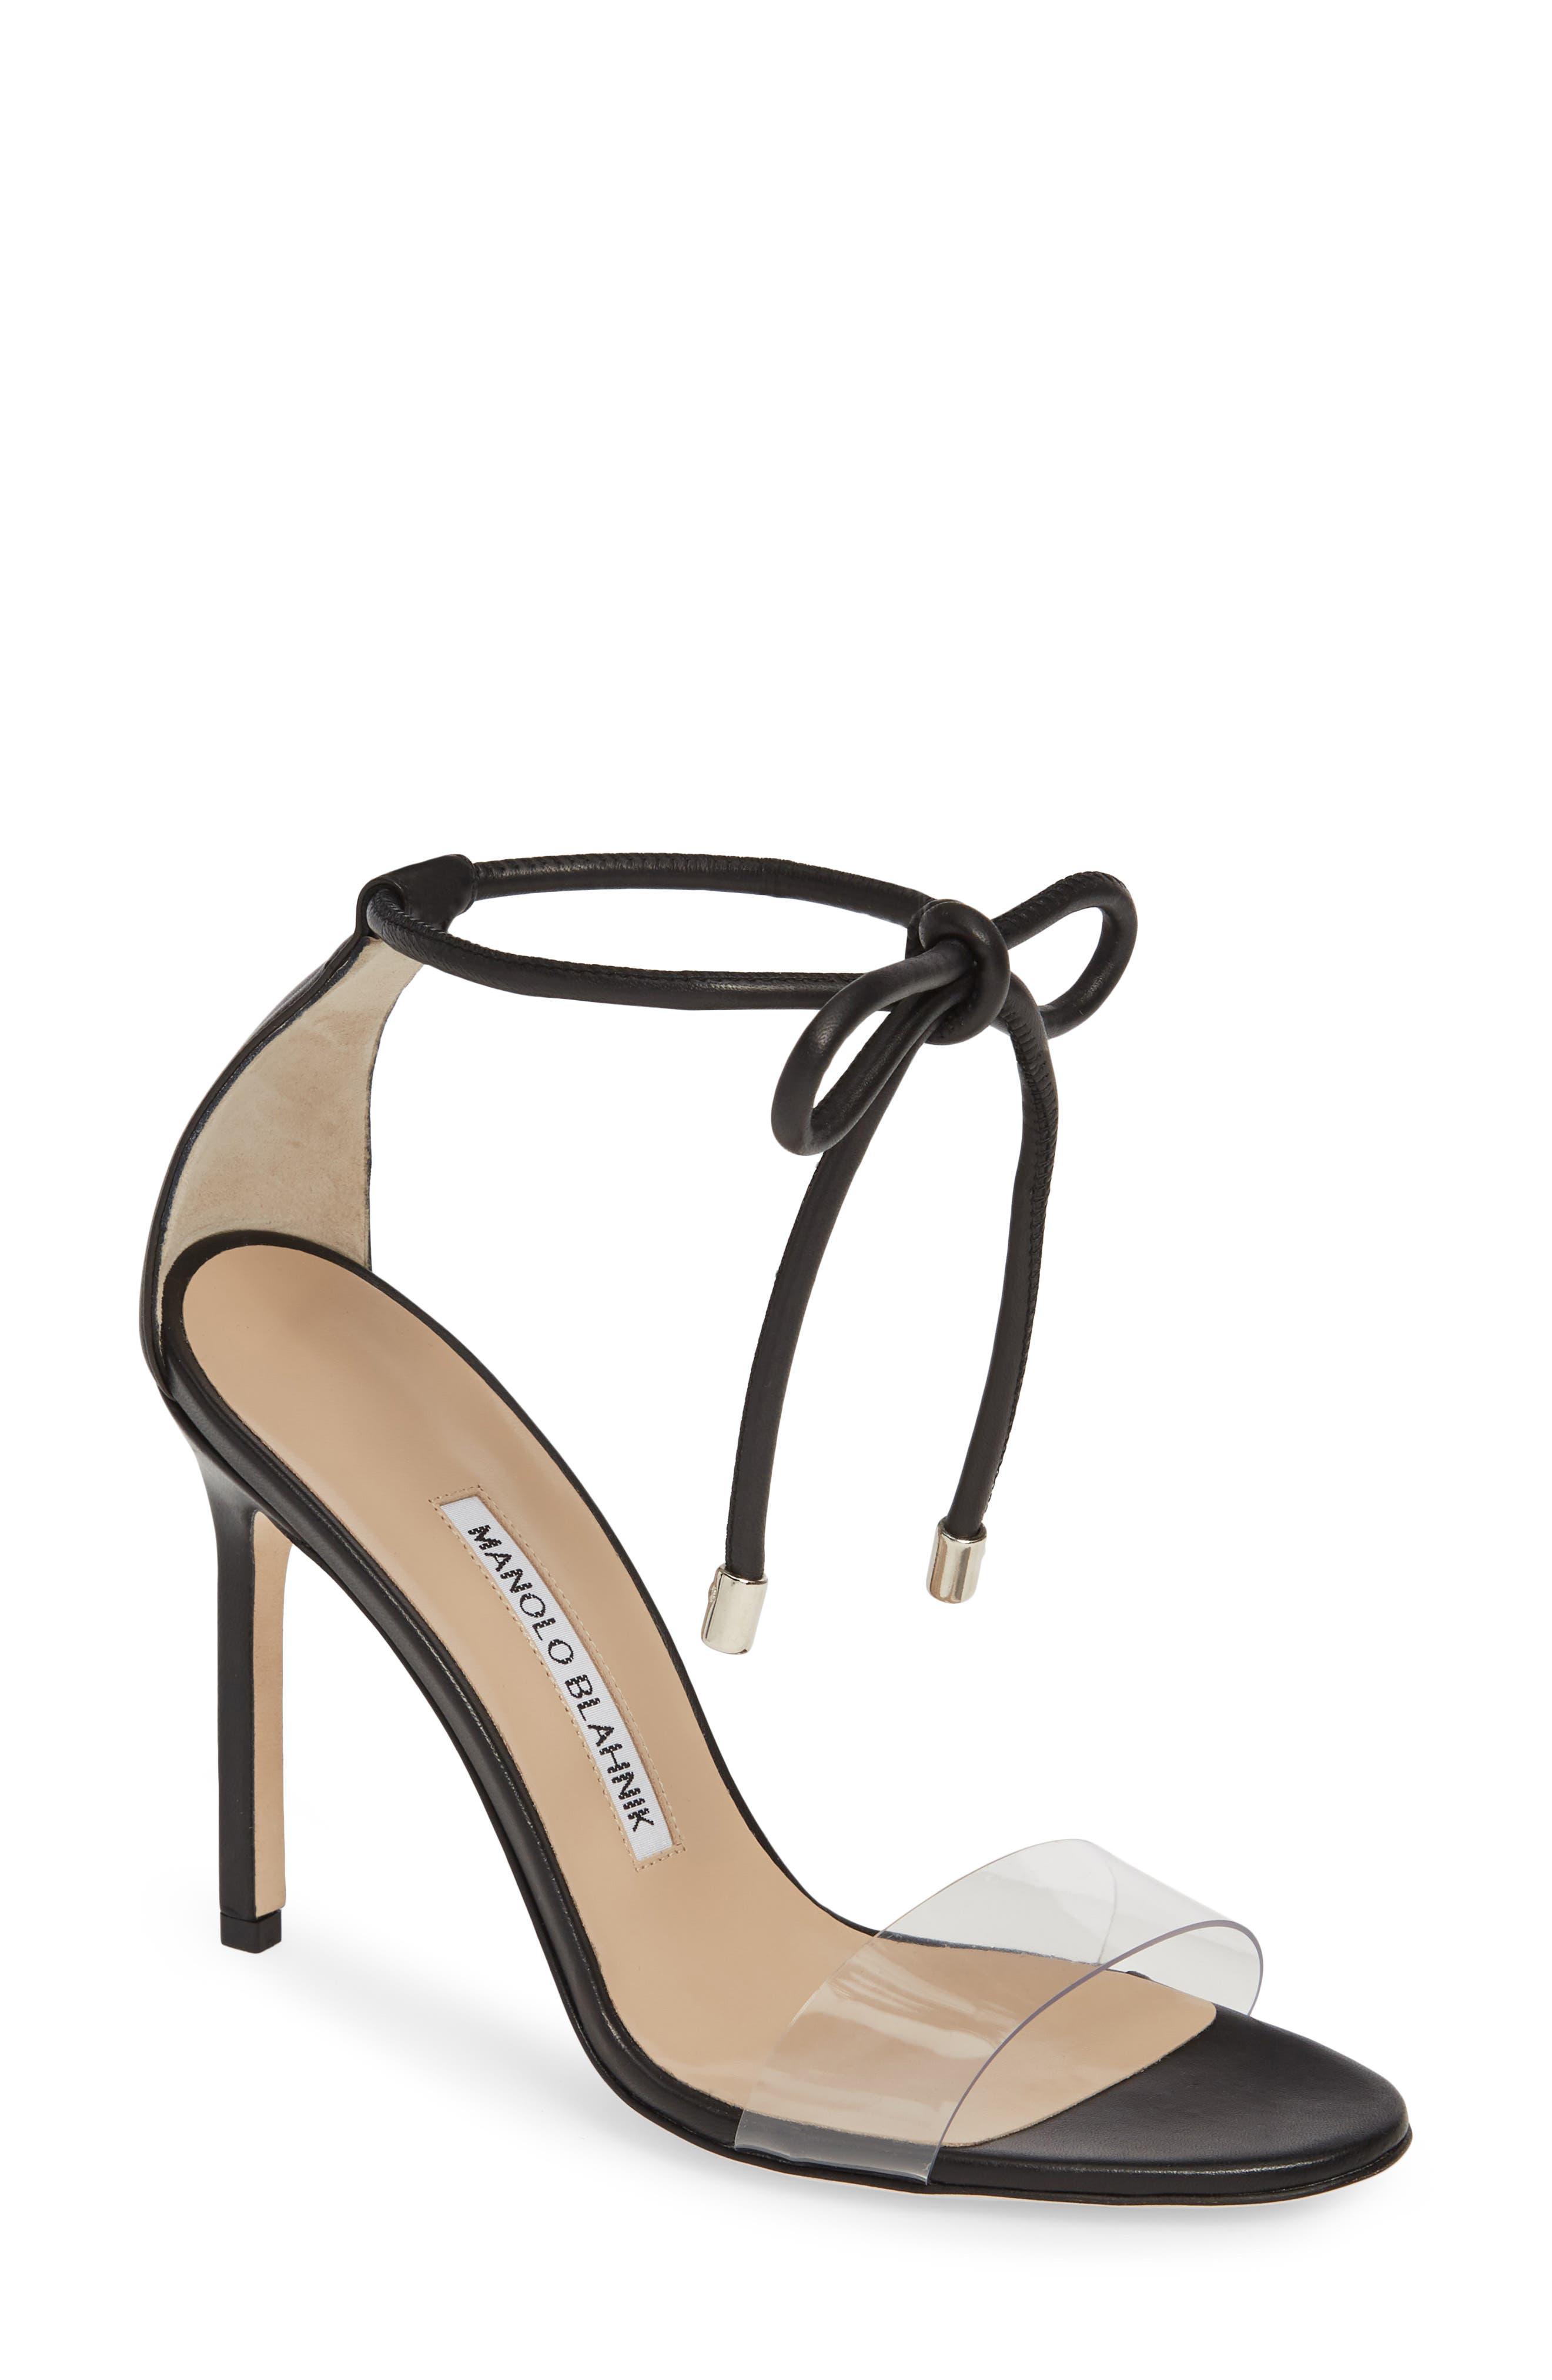 Estro Ankle Tie Sandal by Manolo Blahnik